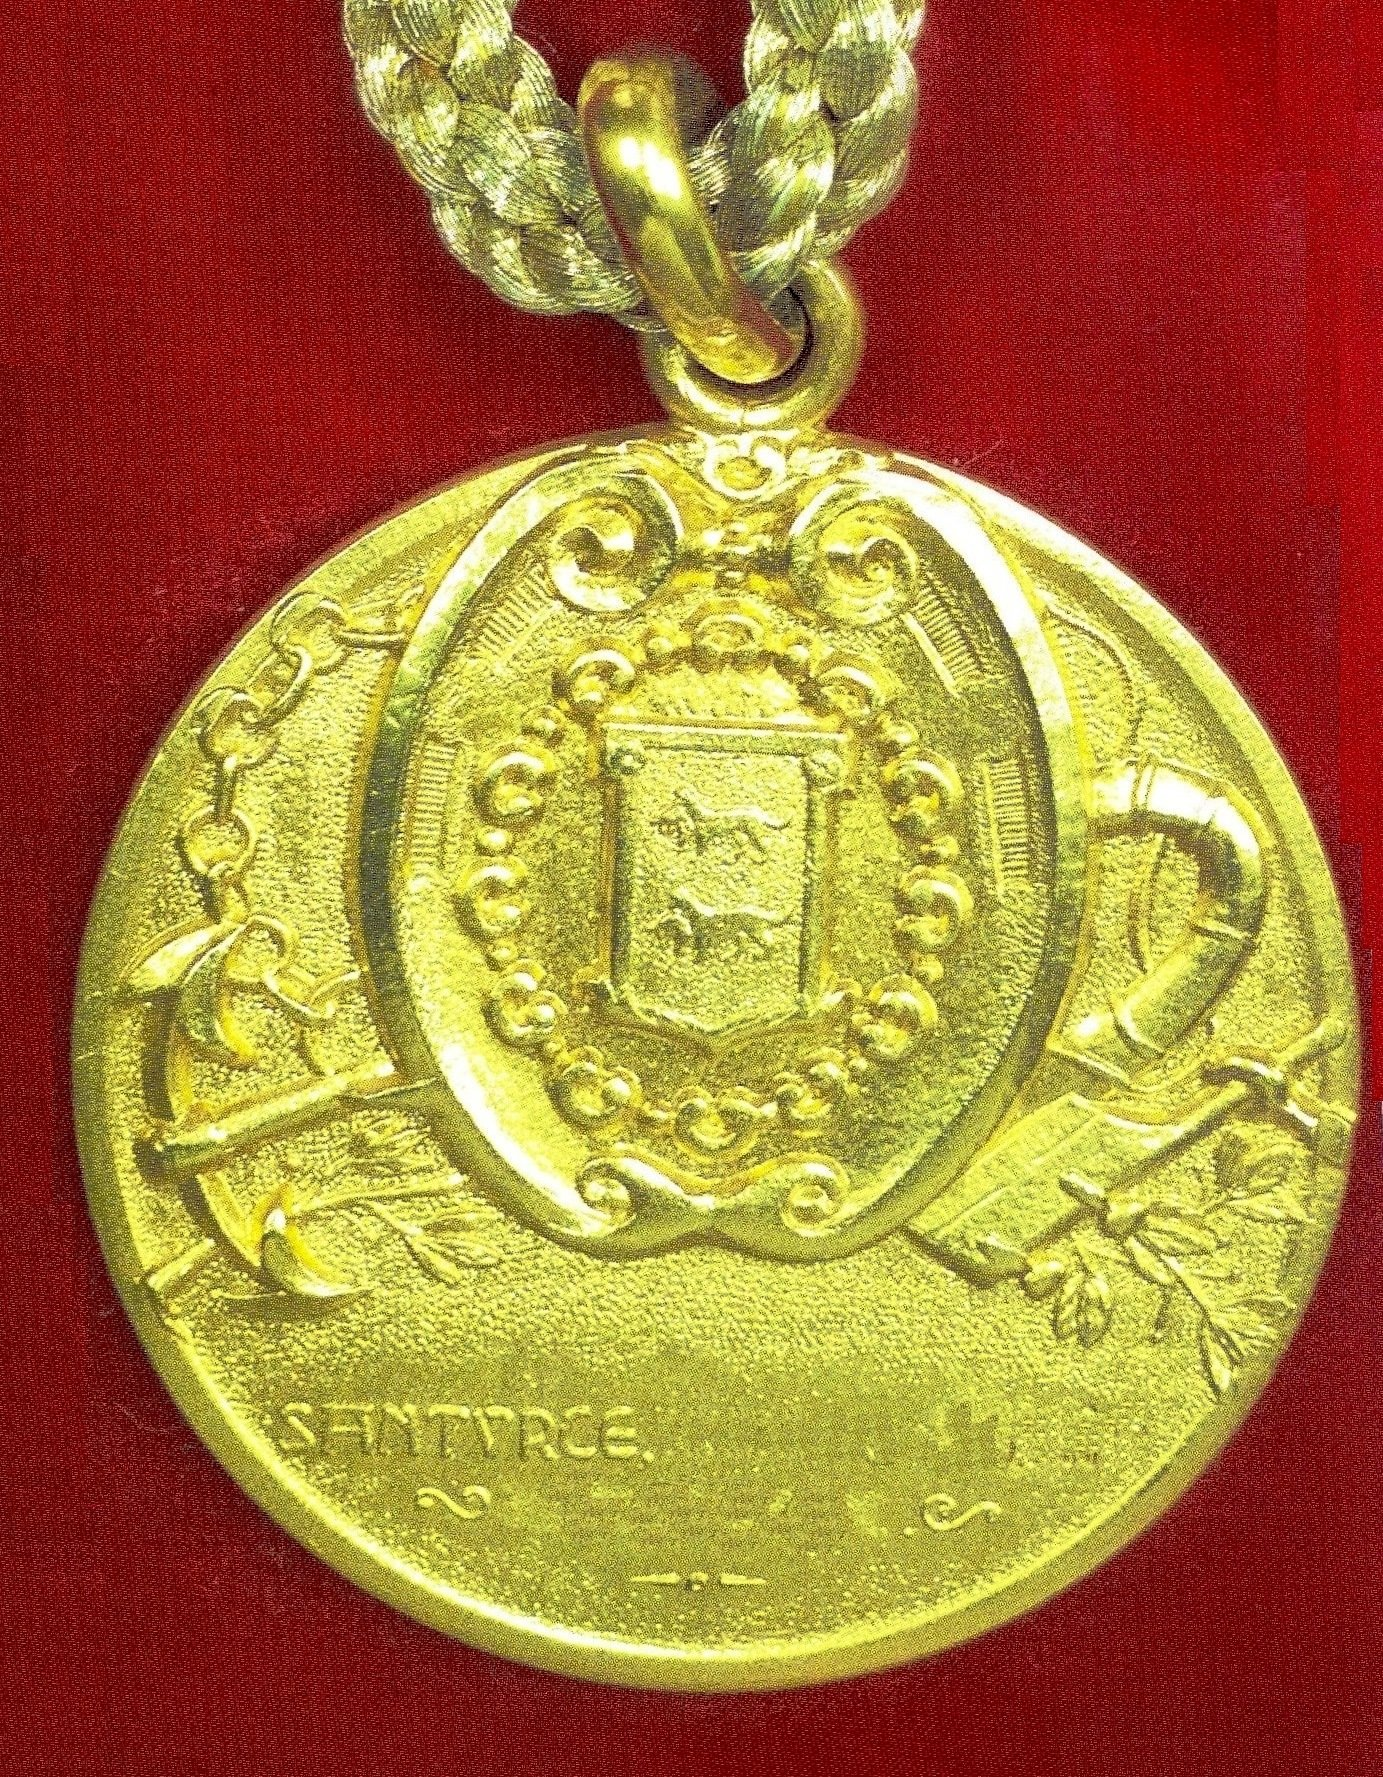 Medalla de Oro de Santurtzi